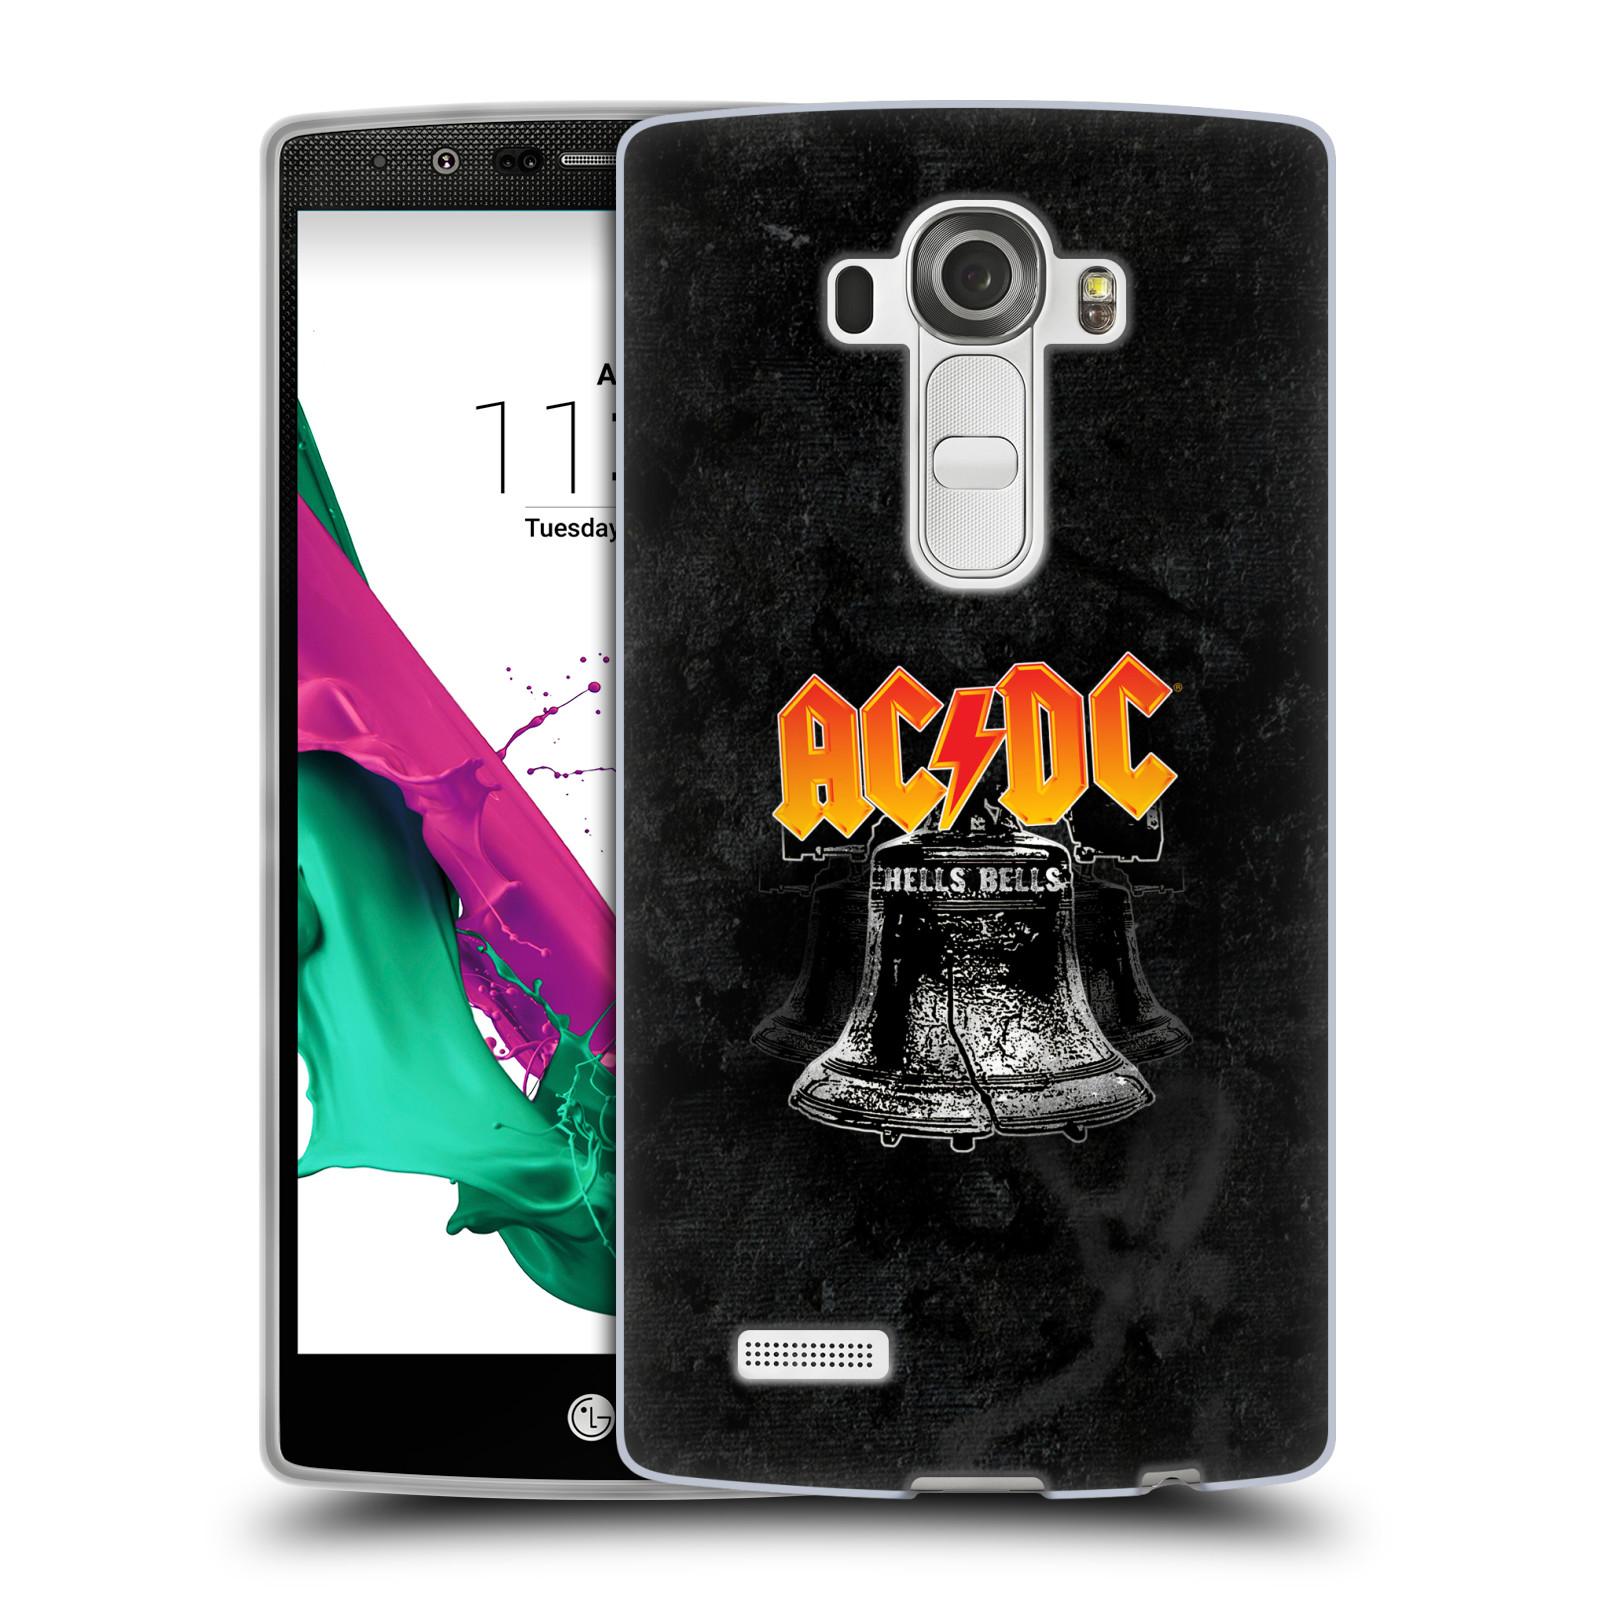 Silikonové pouzdro na mobil LG G4 HEAD CASE AC/DC Hells Bells